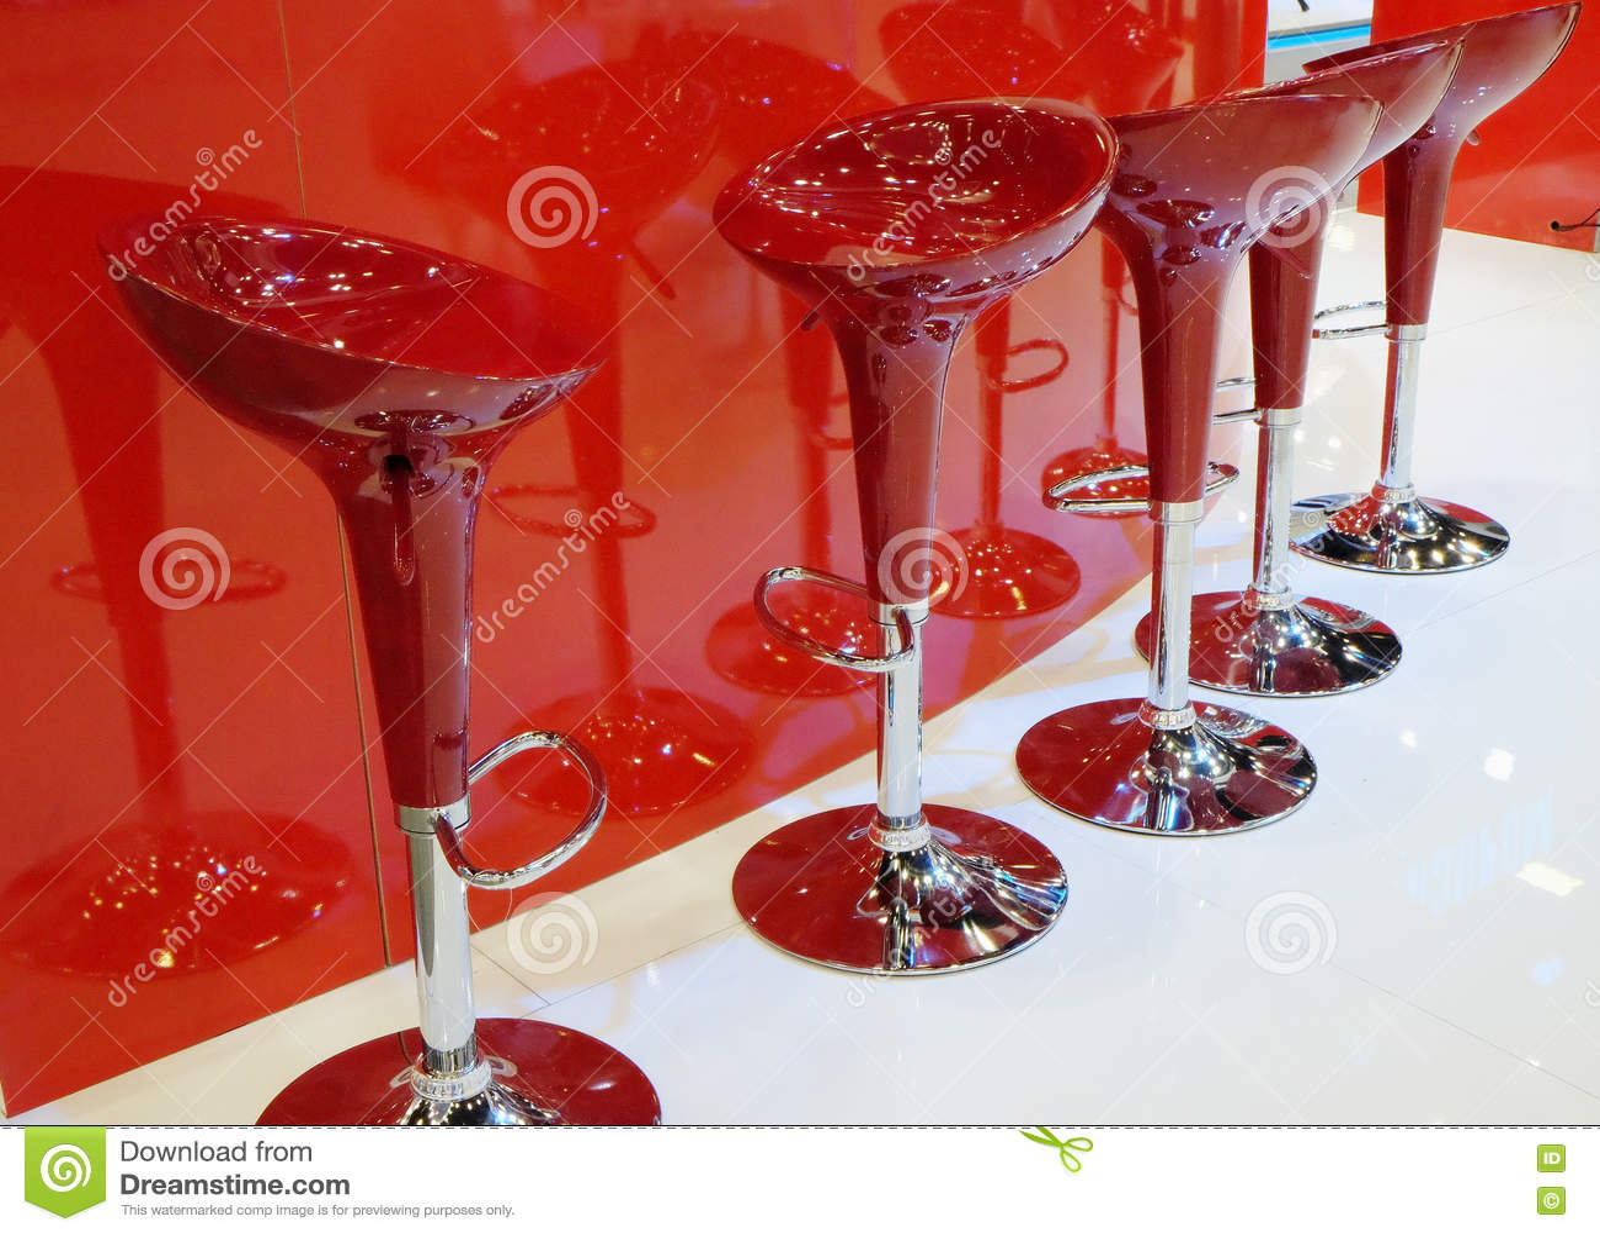 Modern Red Bar Stools Stock Image Image Of Modern Food 79047017